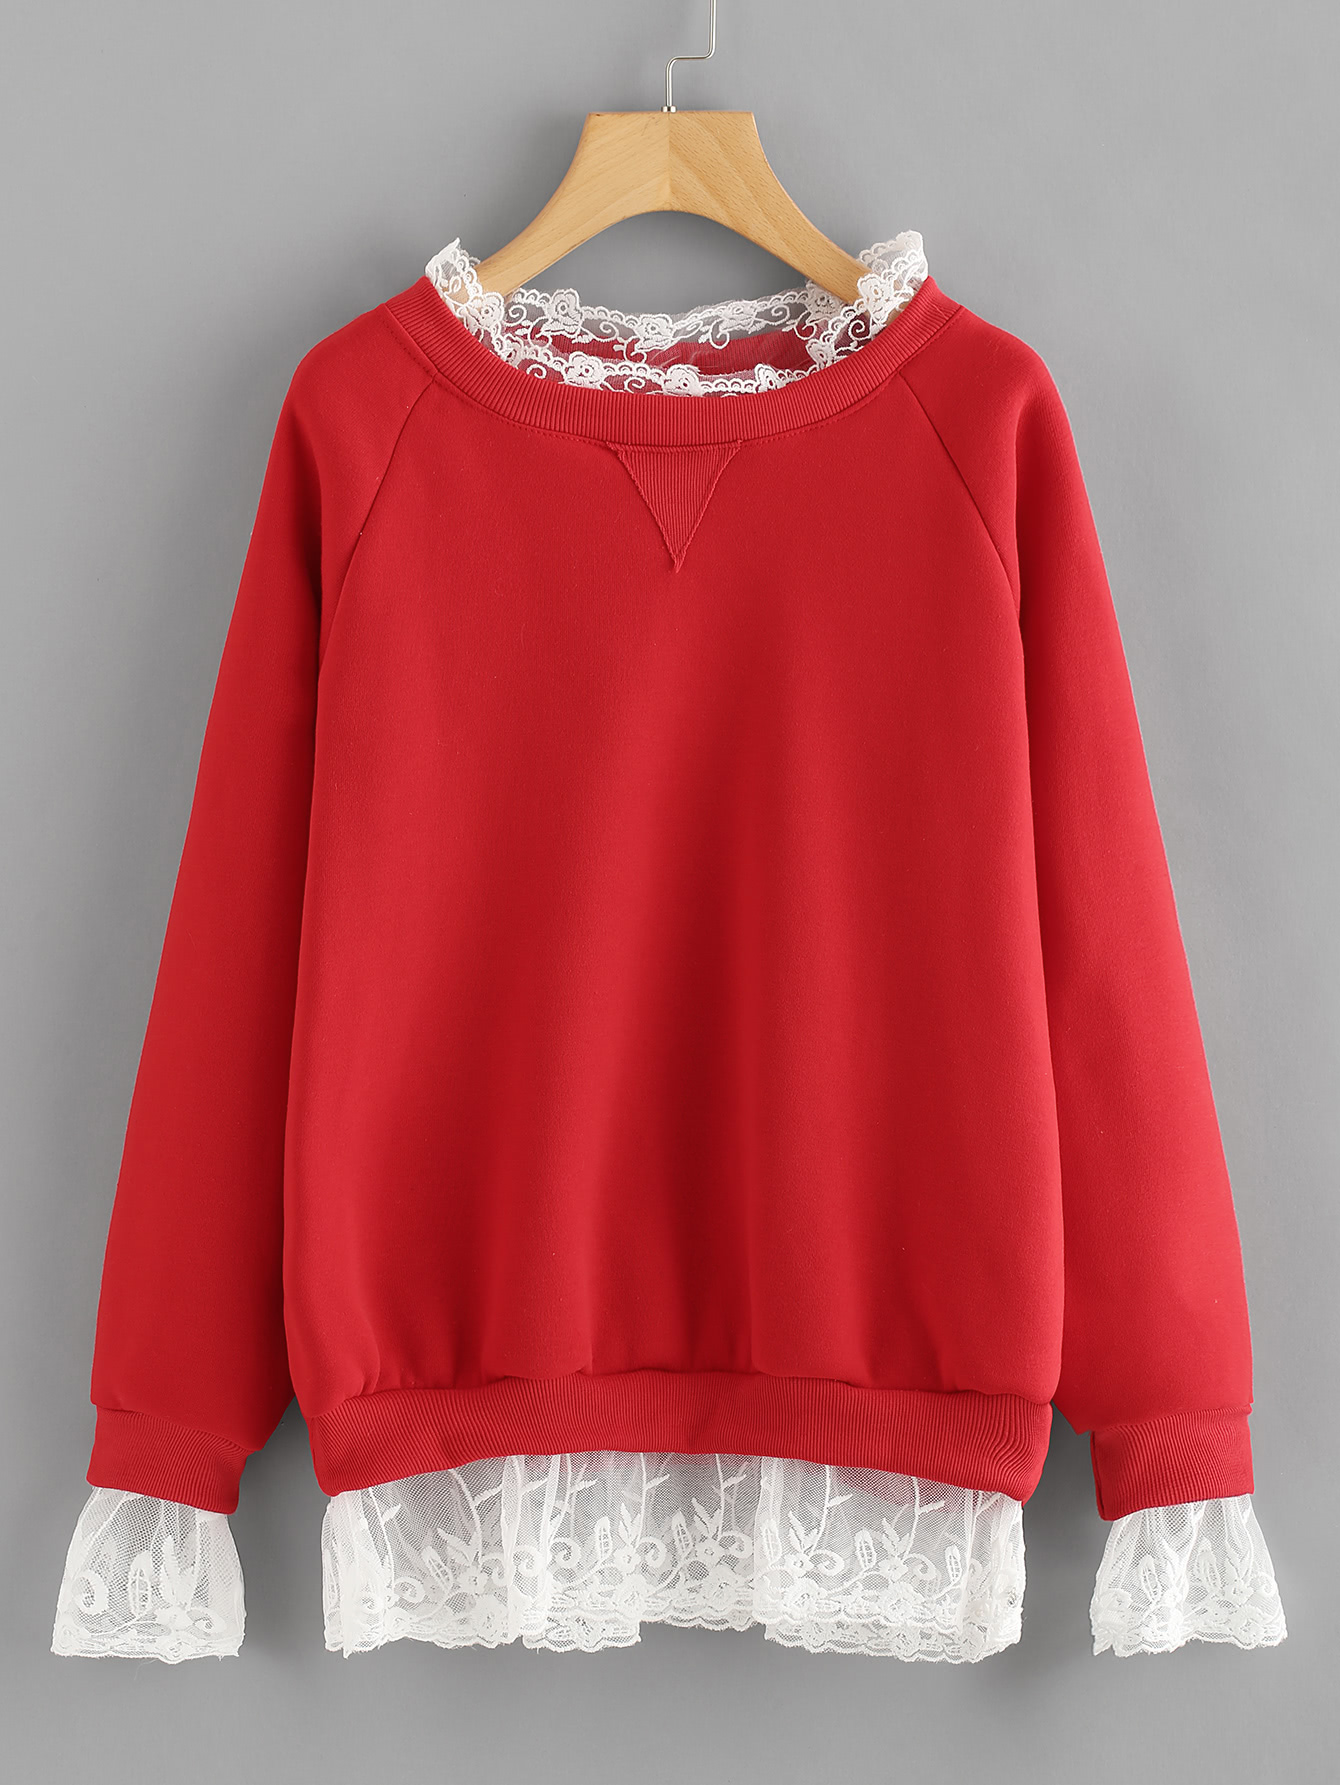 Lace Trim Raglan Sleeve Sweatshirt lace trim raglan sleeve tee